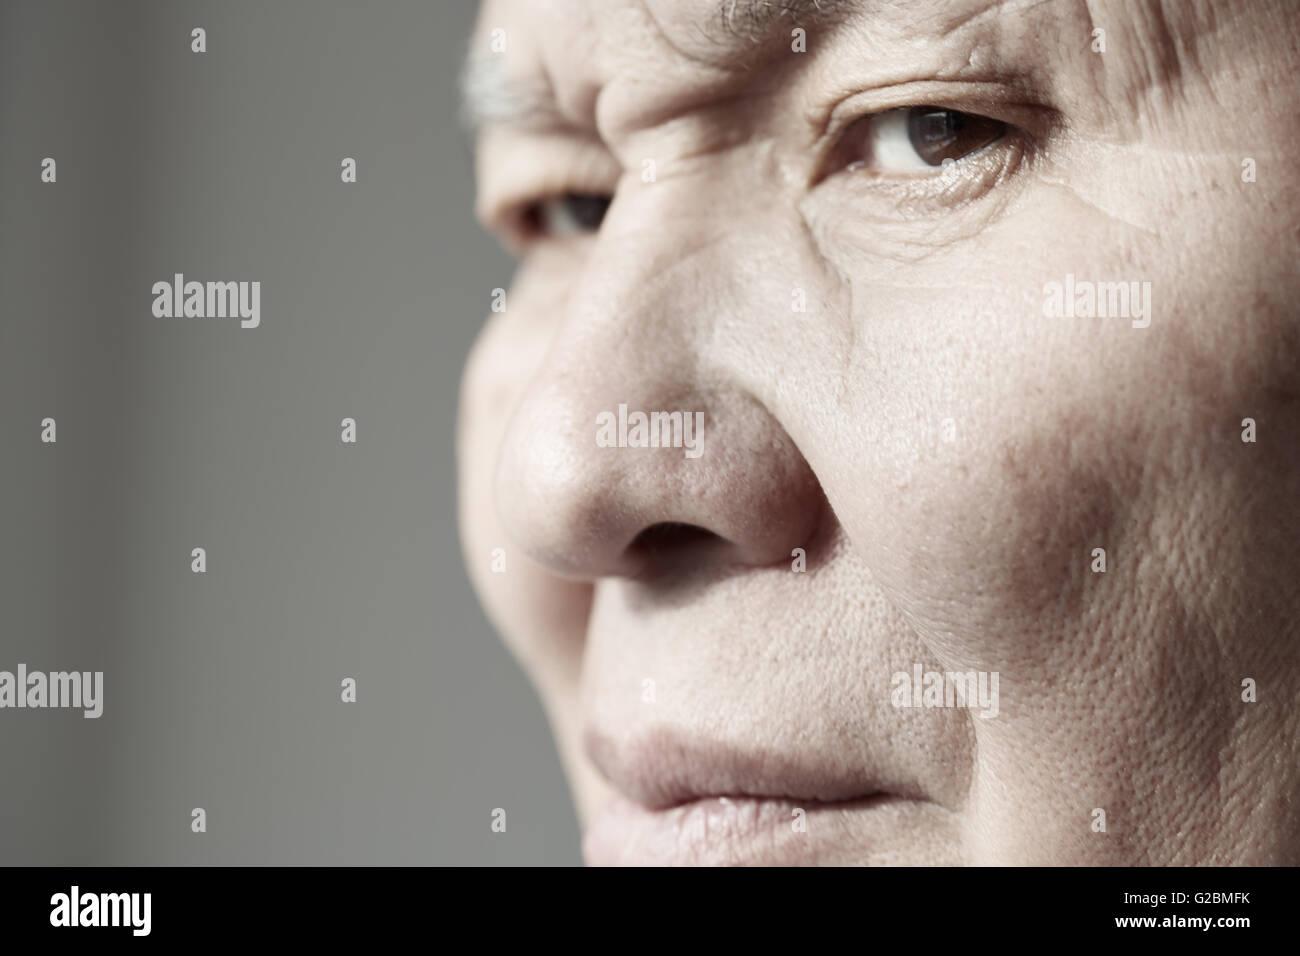 Face of elderly man looking at camera. Horizontal photo - Stock Image